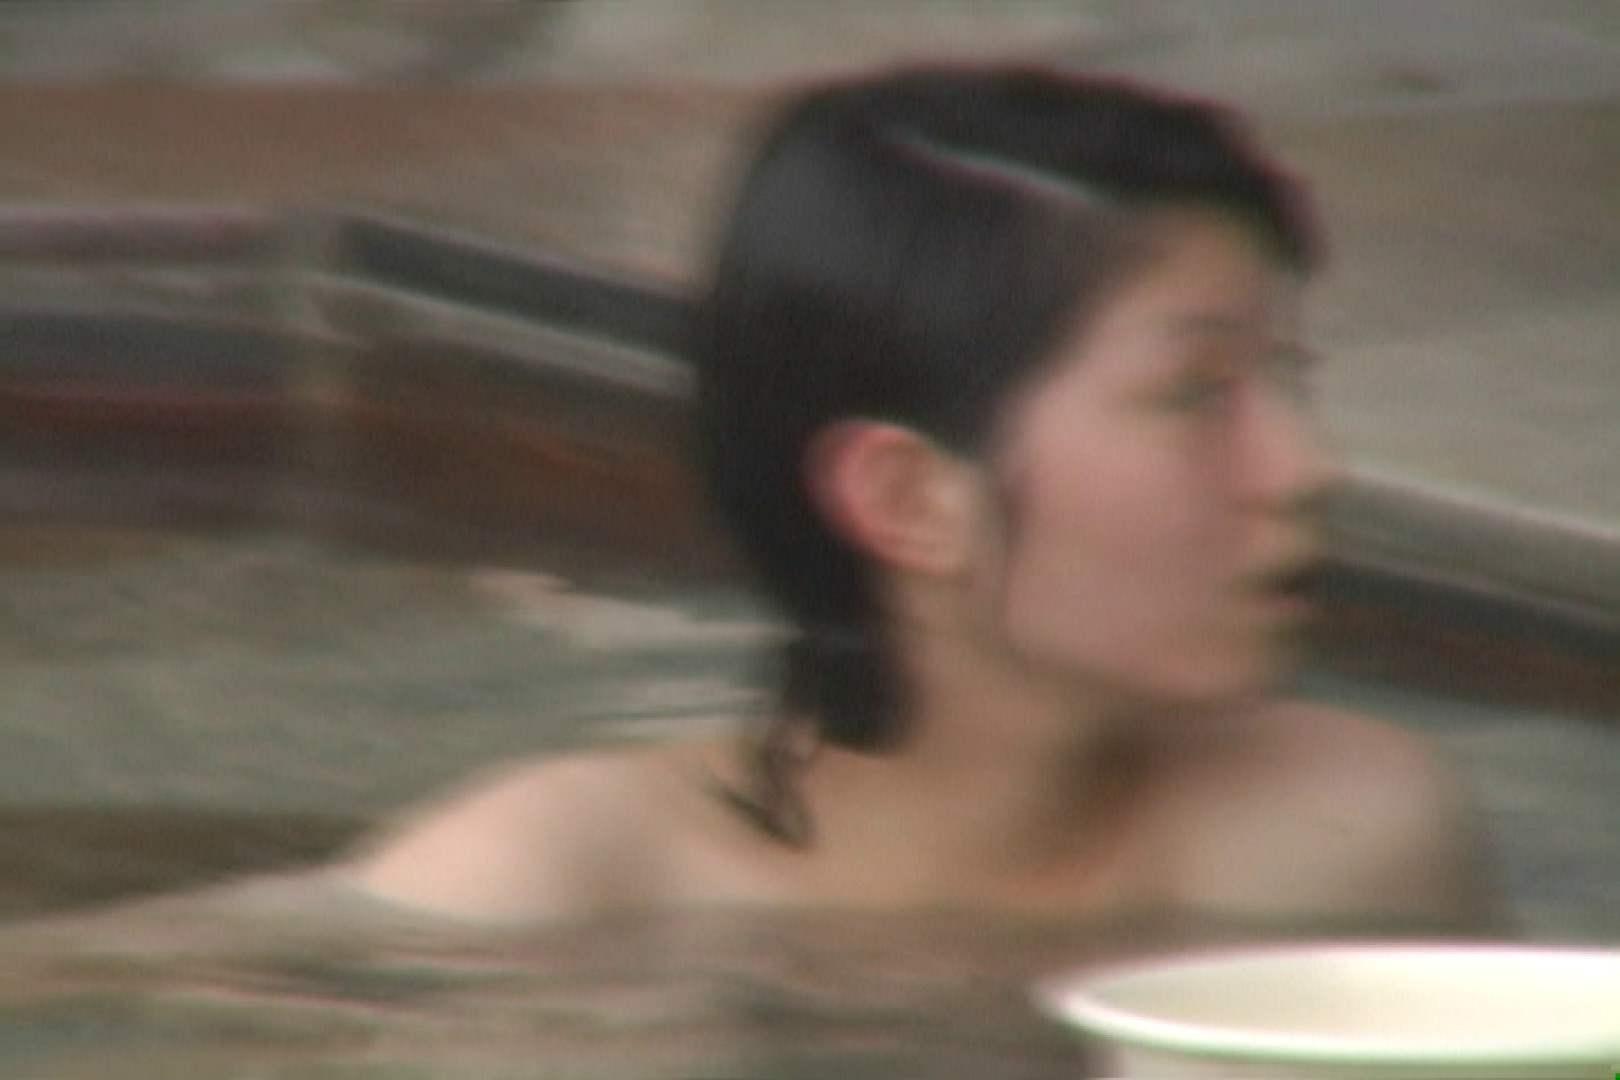 Aquaな露天風呂Vol.579 OL女体  72連発 51